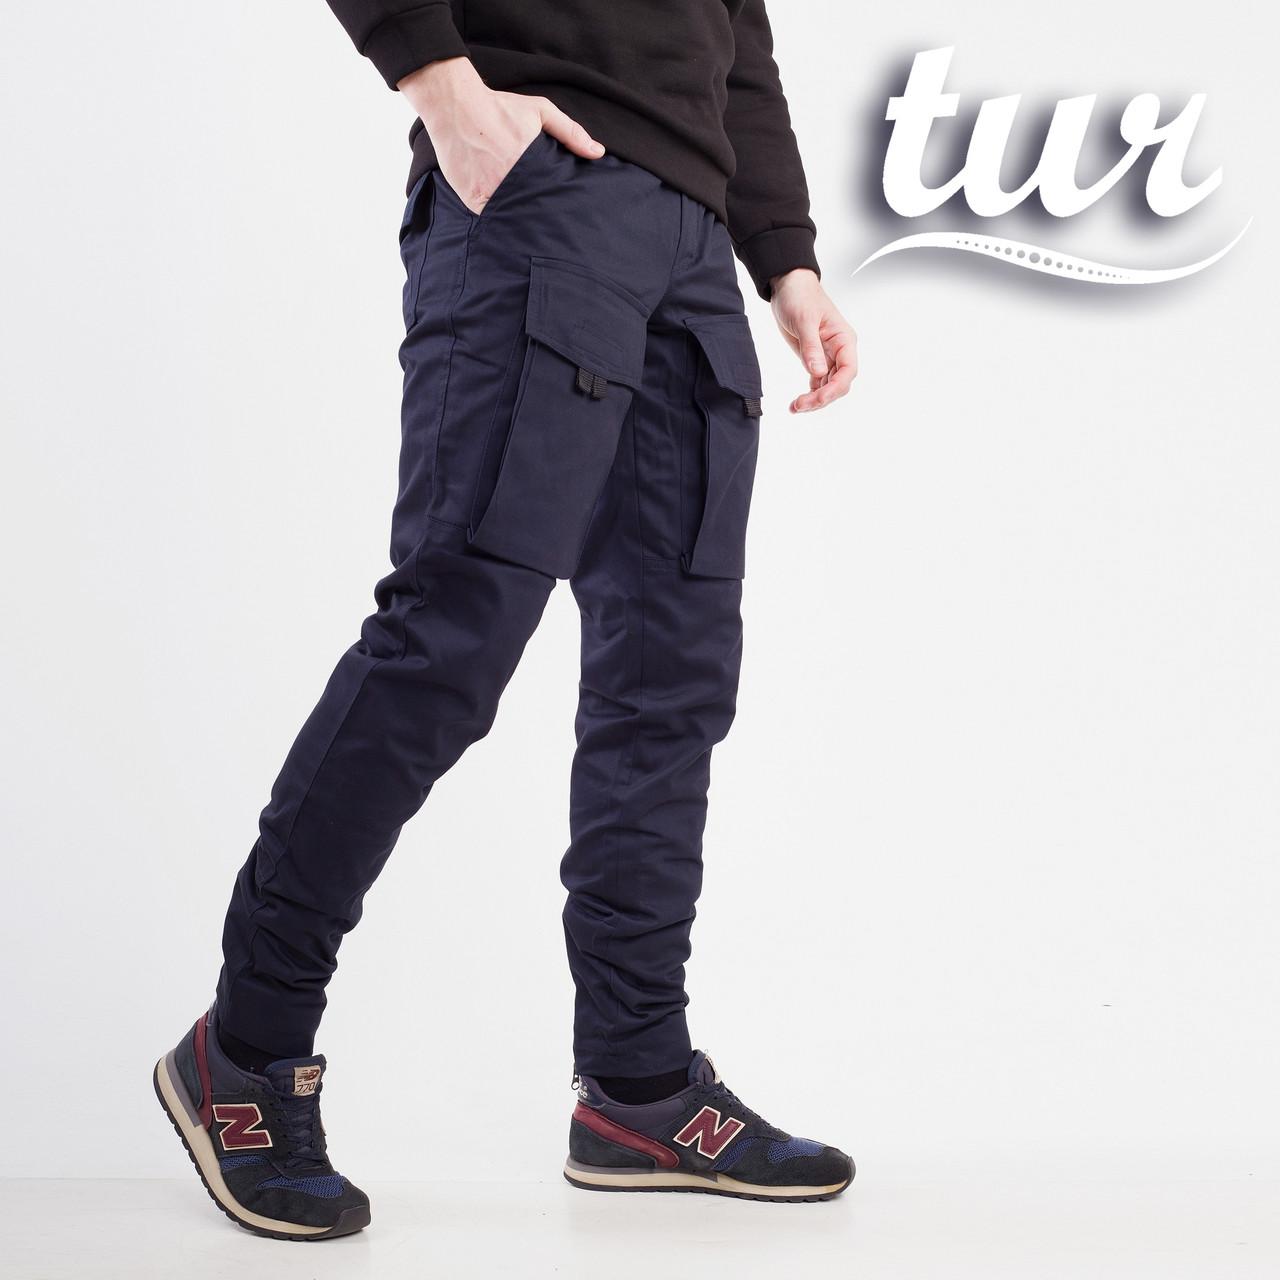 Теплые штаны карго на флисе мужские темно-синие бренд ТУР модель Один (Odin) размер S, M, L, XL, XXL